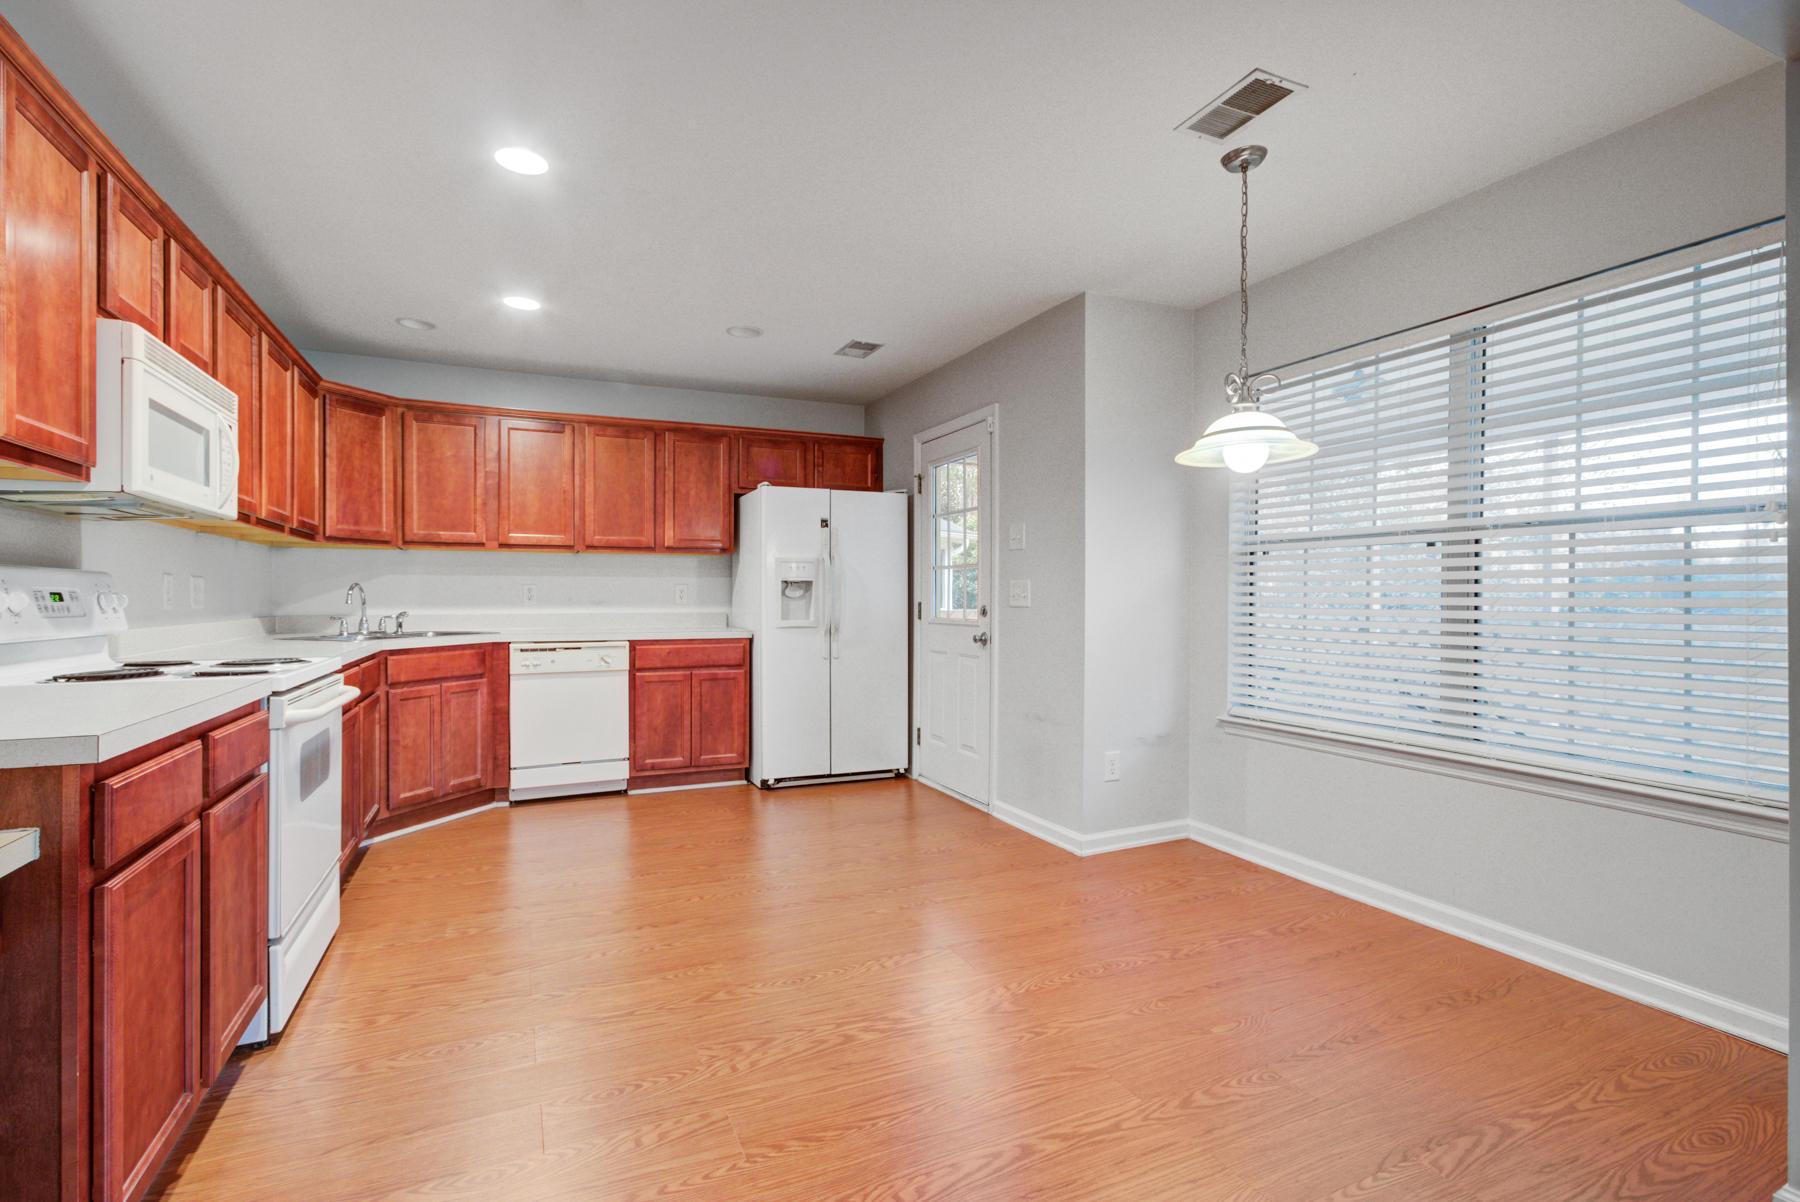 Grand Oaks Plantation Homes For Sale - 564 Hainesworth, Charleston, SC - 2